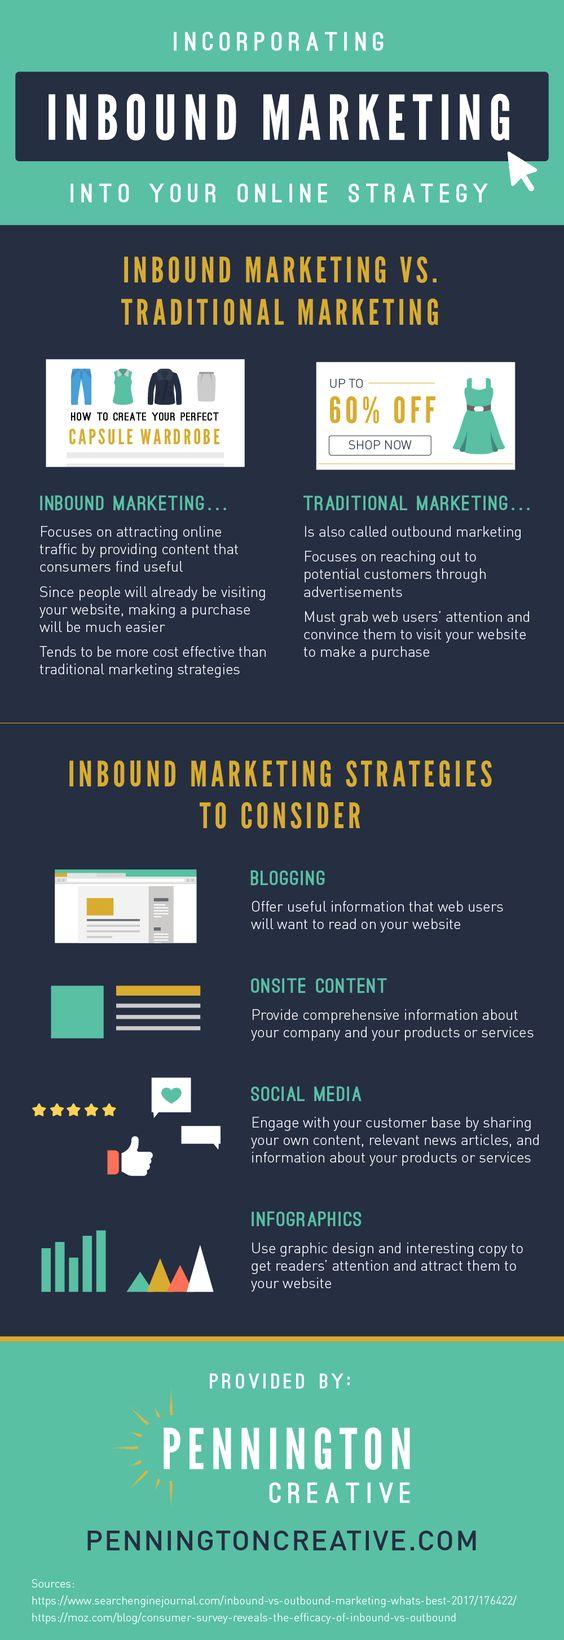 optimized websites beat traditional marketing